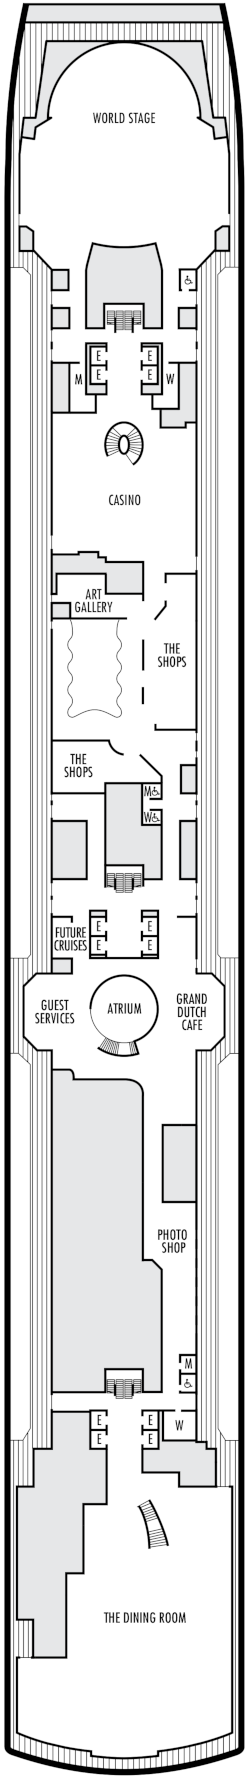 Koningsdam Promenade Deck Deck Plan